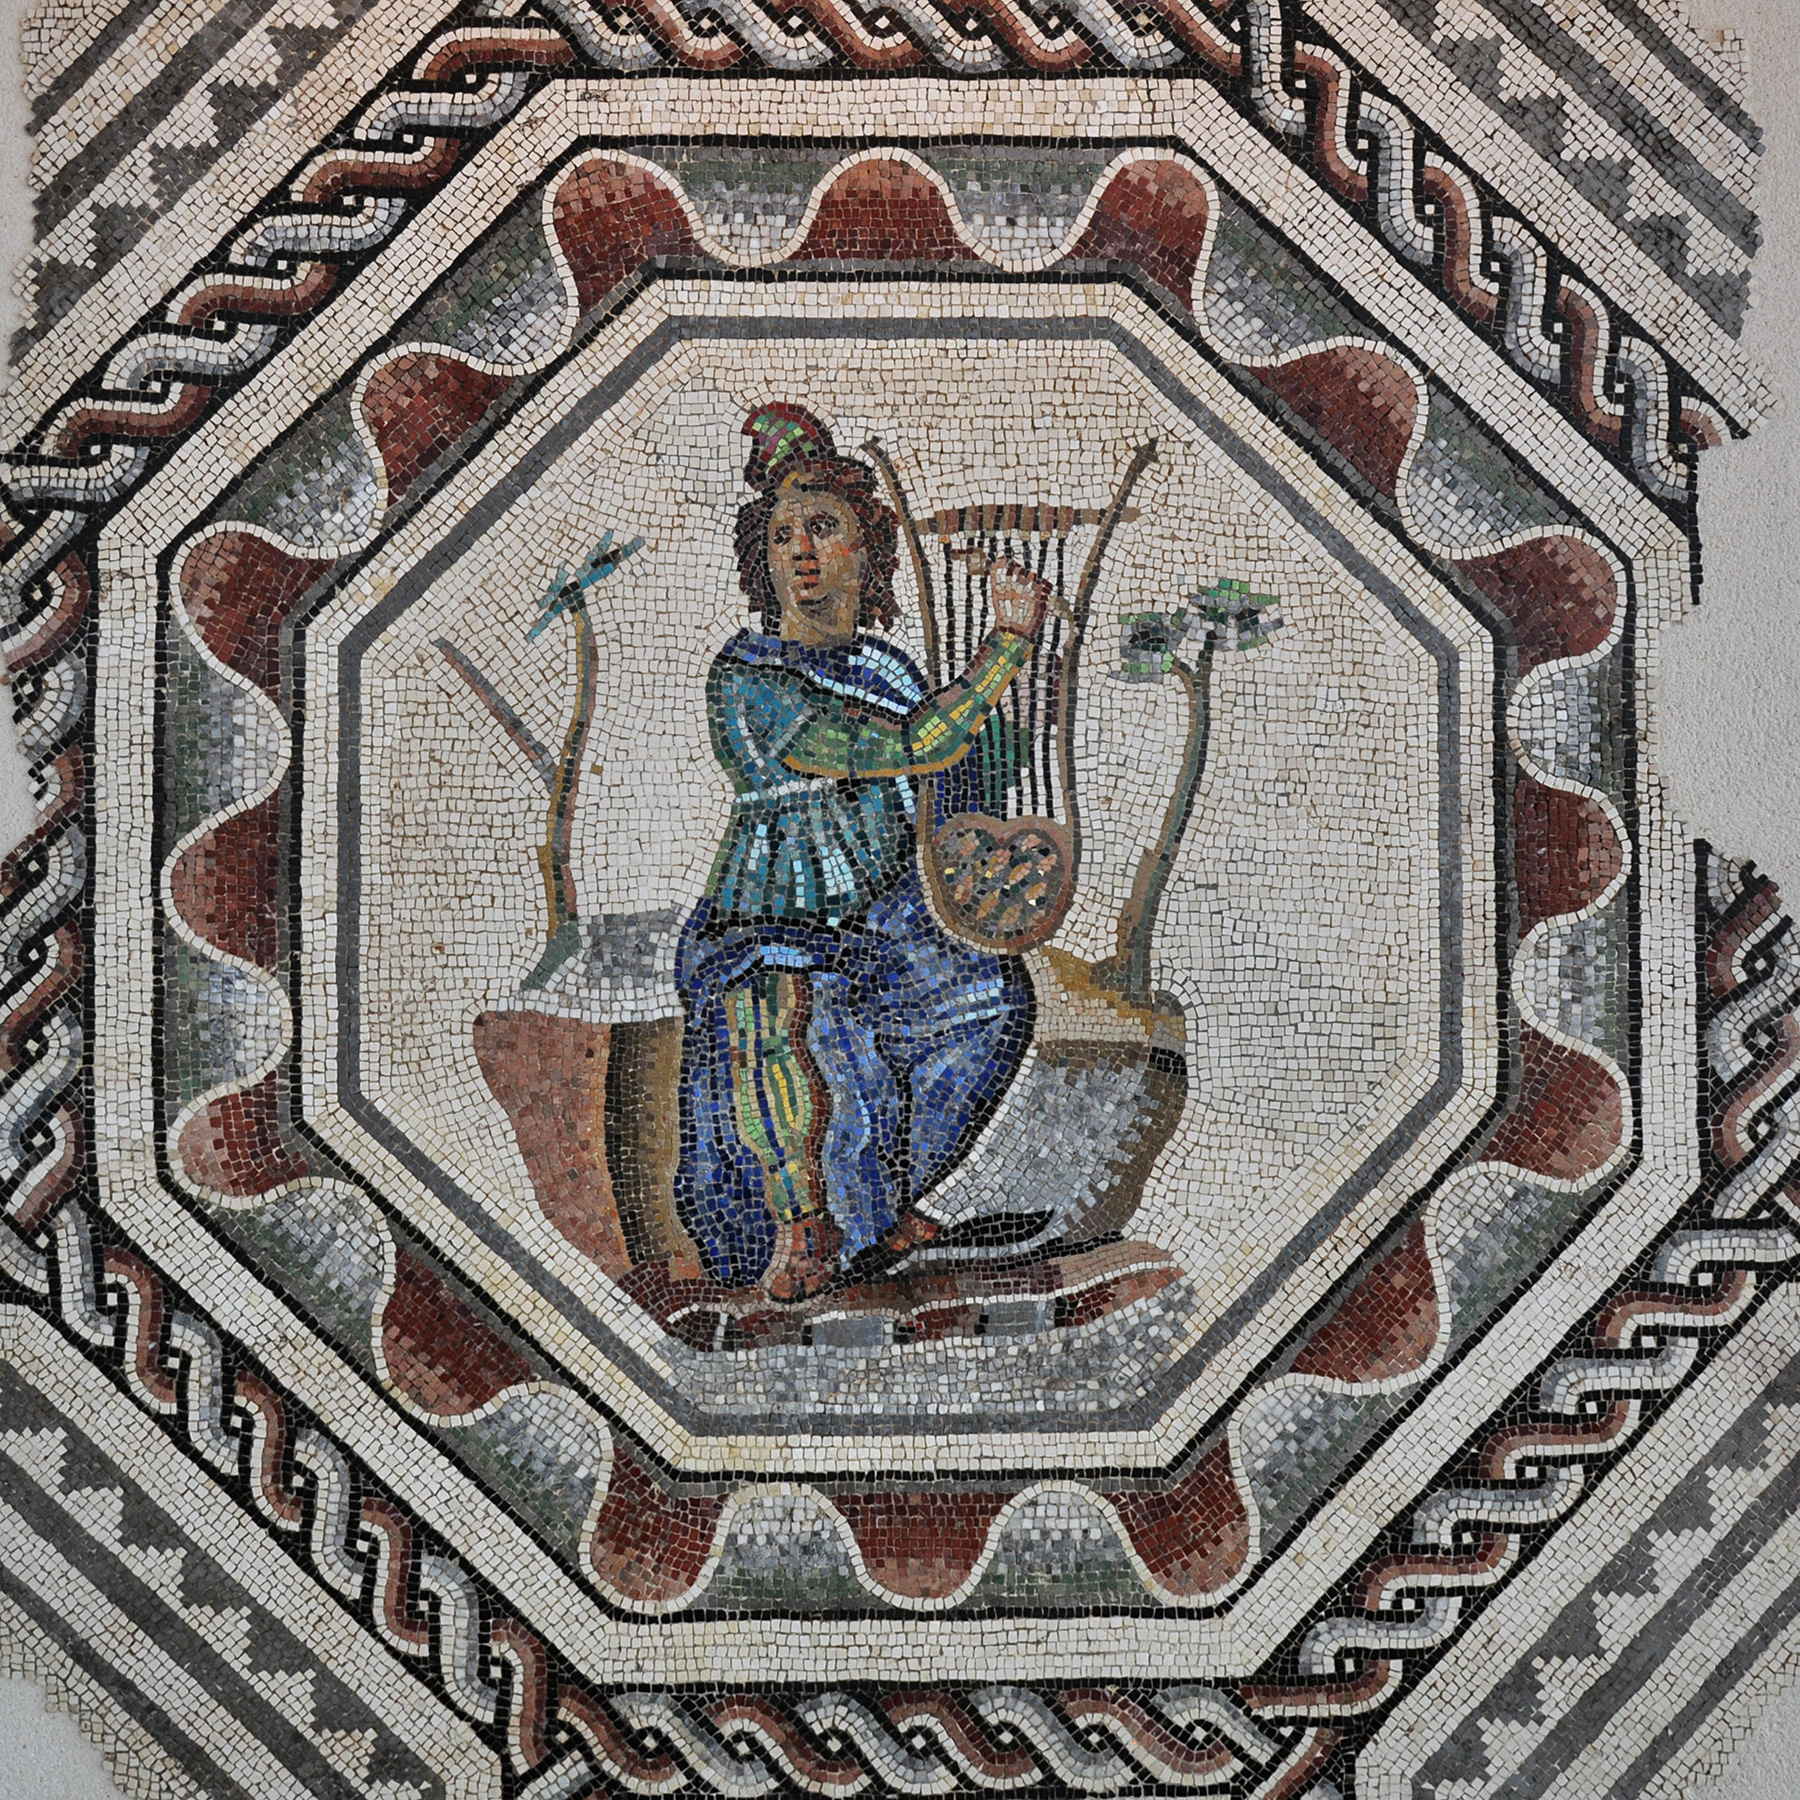 file mus e gr de saint romain en gal 27 07 2011 20 orph wikimedia commons. Black Bedroom Furniture Sets. Home Design Ideas